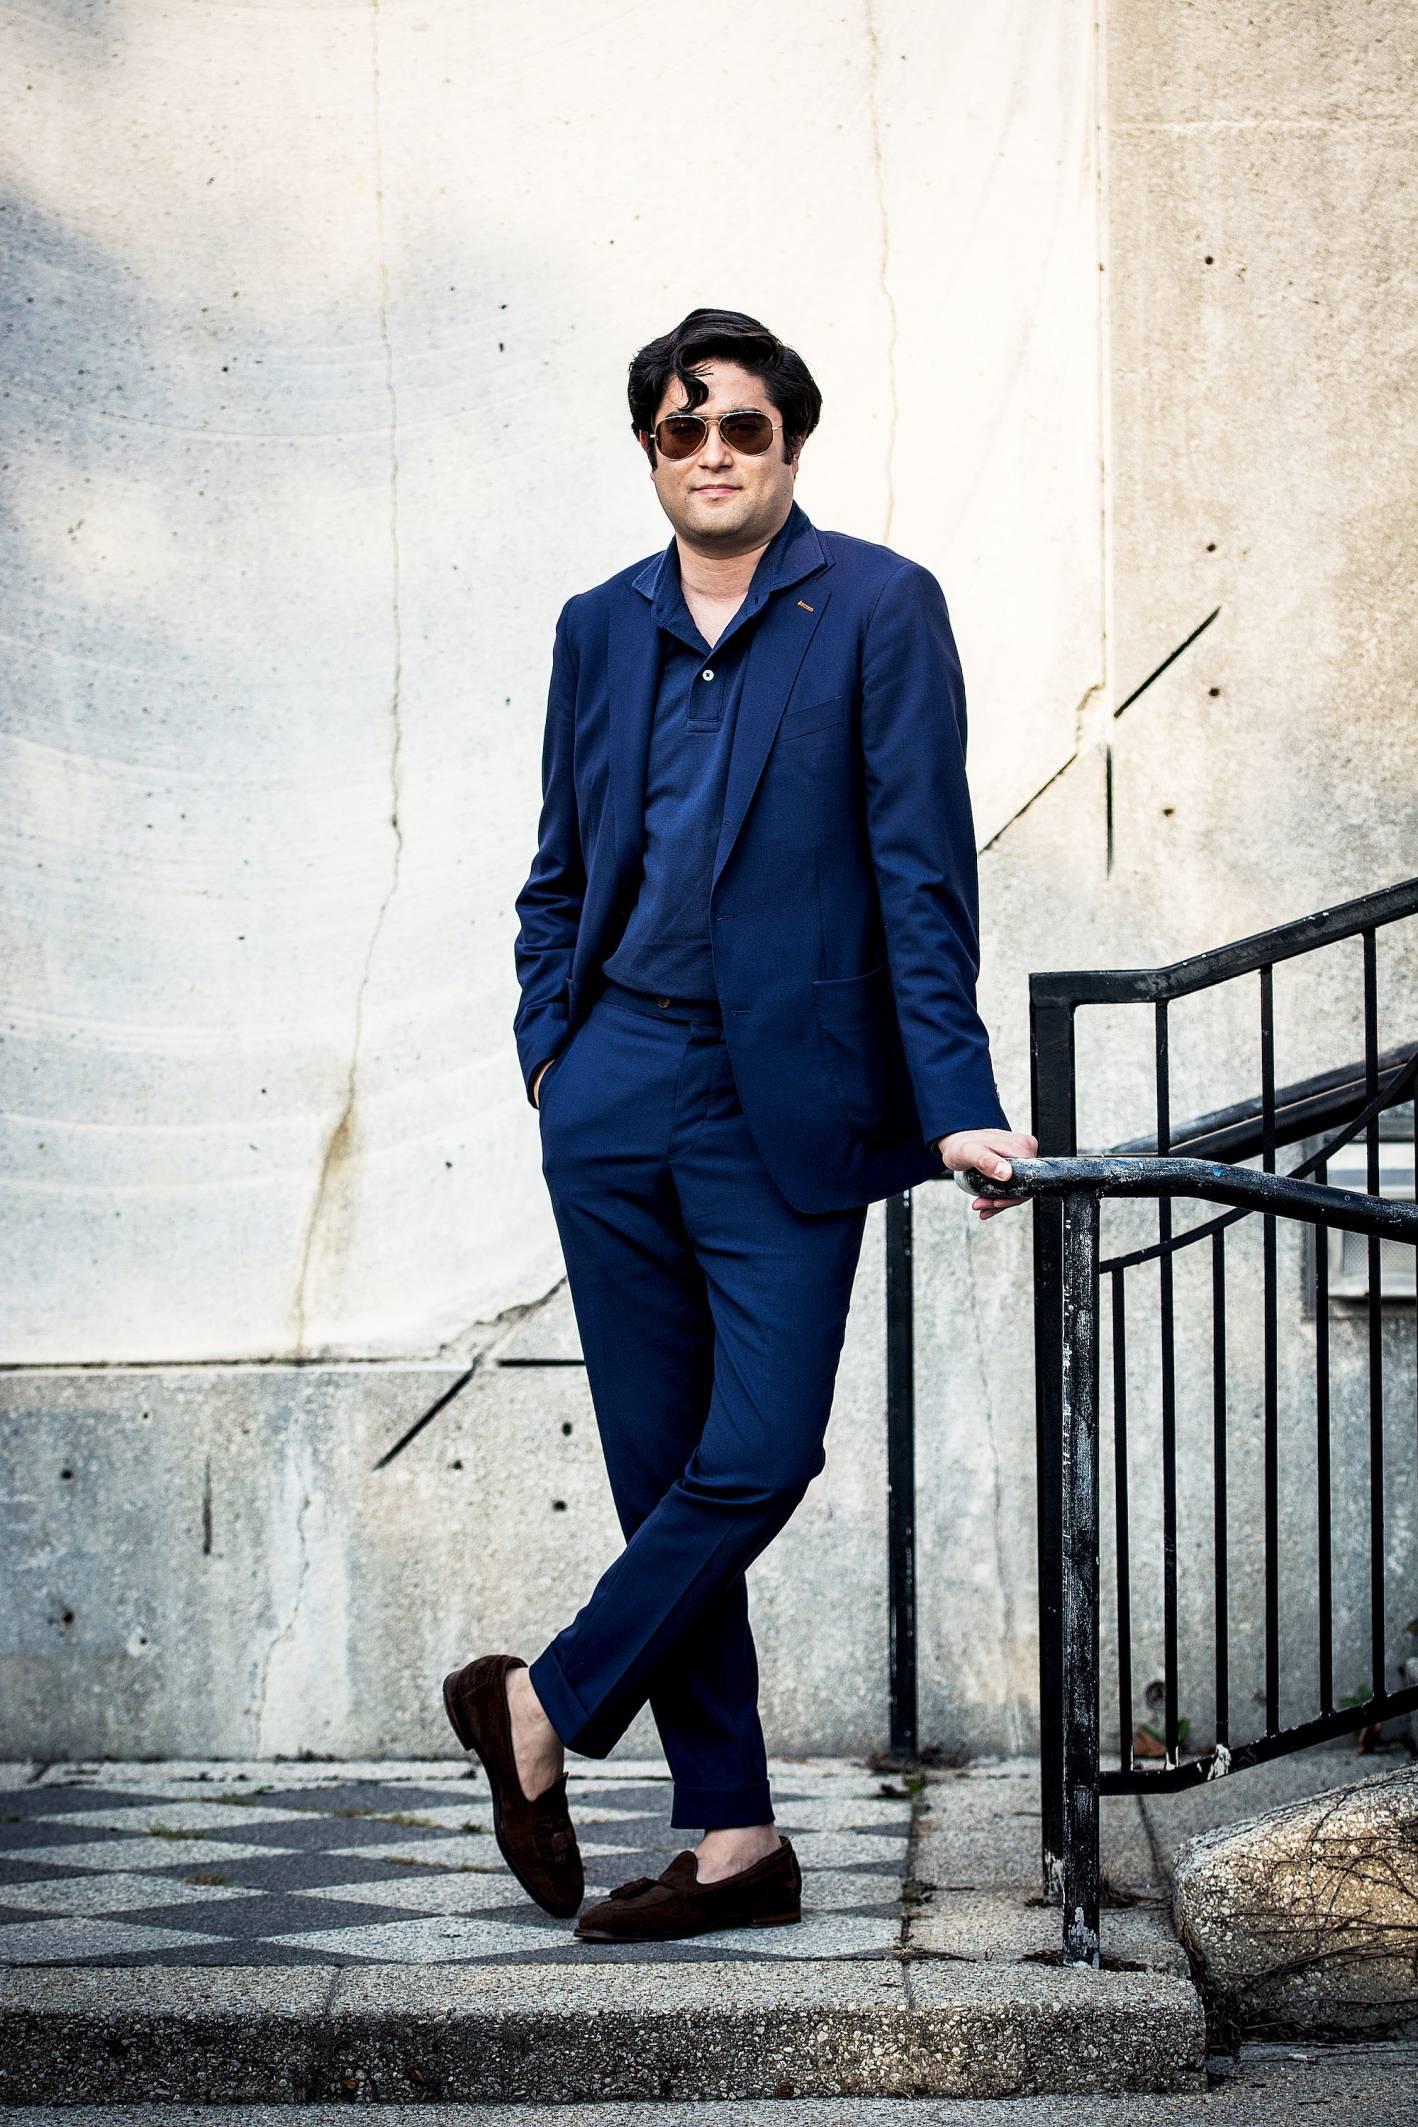 kiyoshi martinez, what he wore, style, style essentials, week wardrobe, men's style, men's fashion, menswear, style, fashion